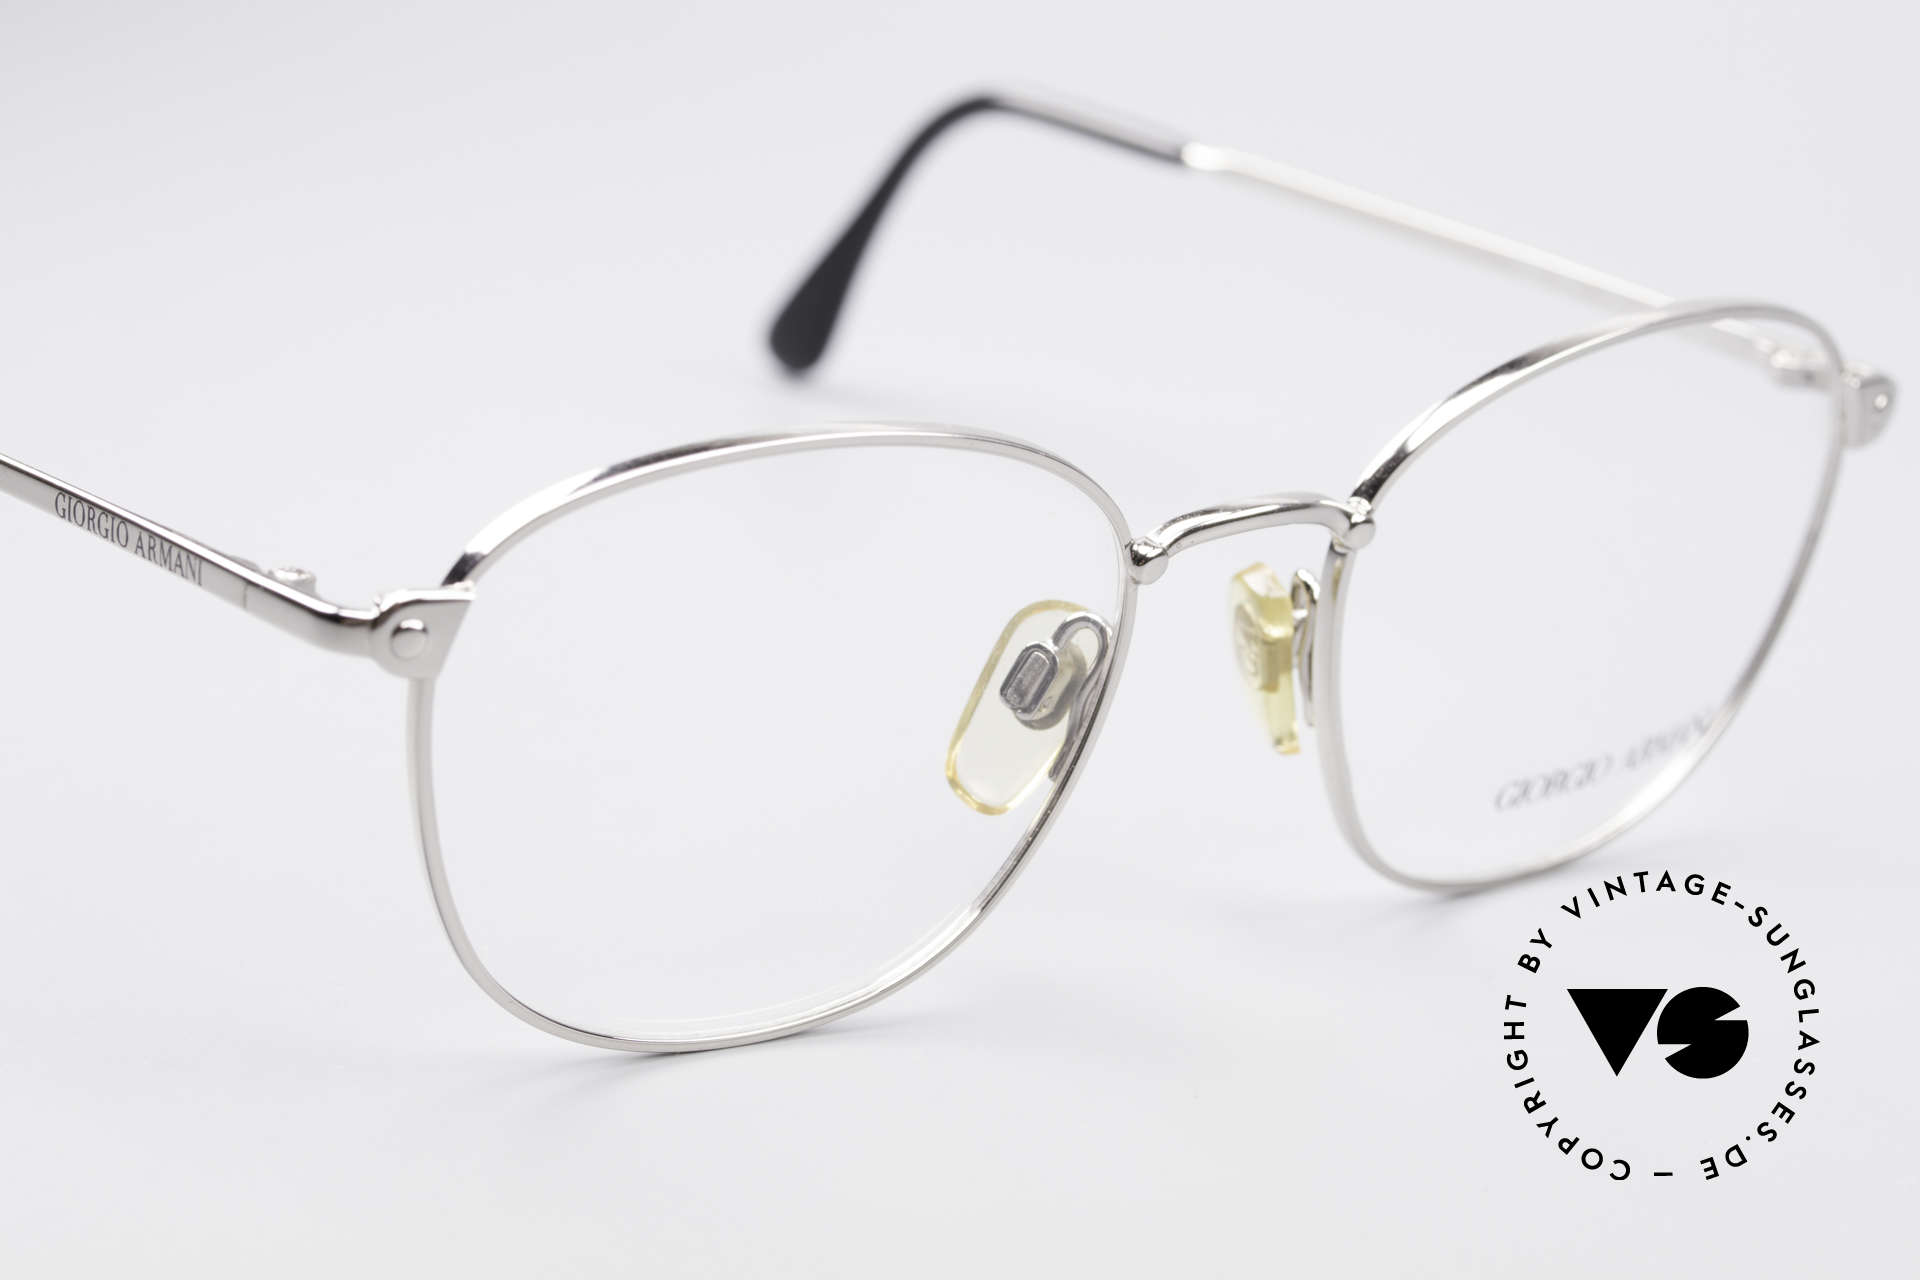 Giorgio Armani 168 Men's Vintage Eyeglasses 80's, NO RETRO EYEWEAR, but a 30 years old Original, Made for Men